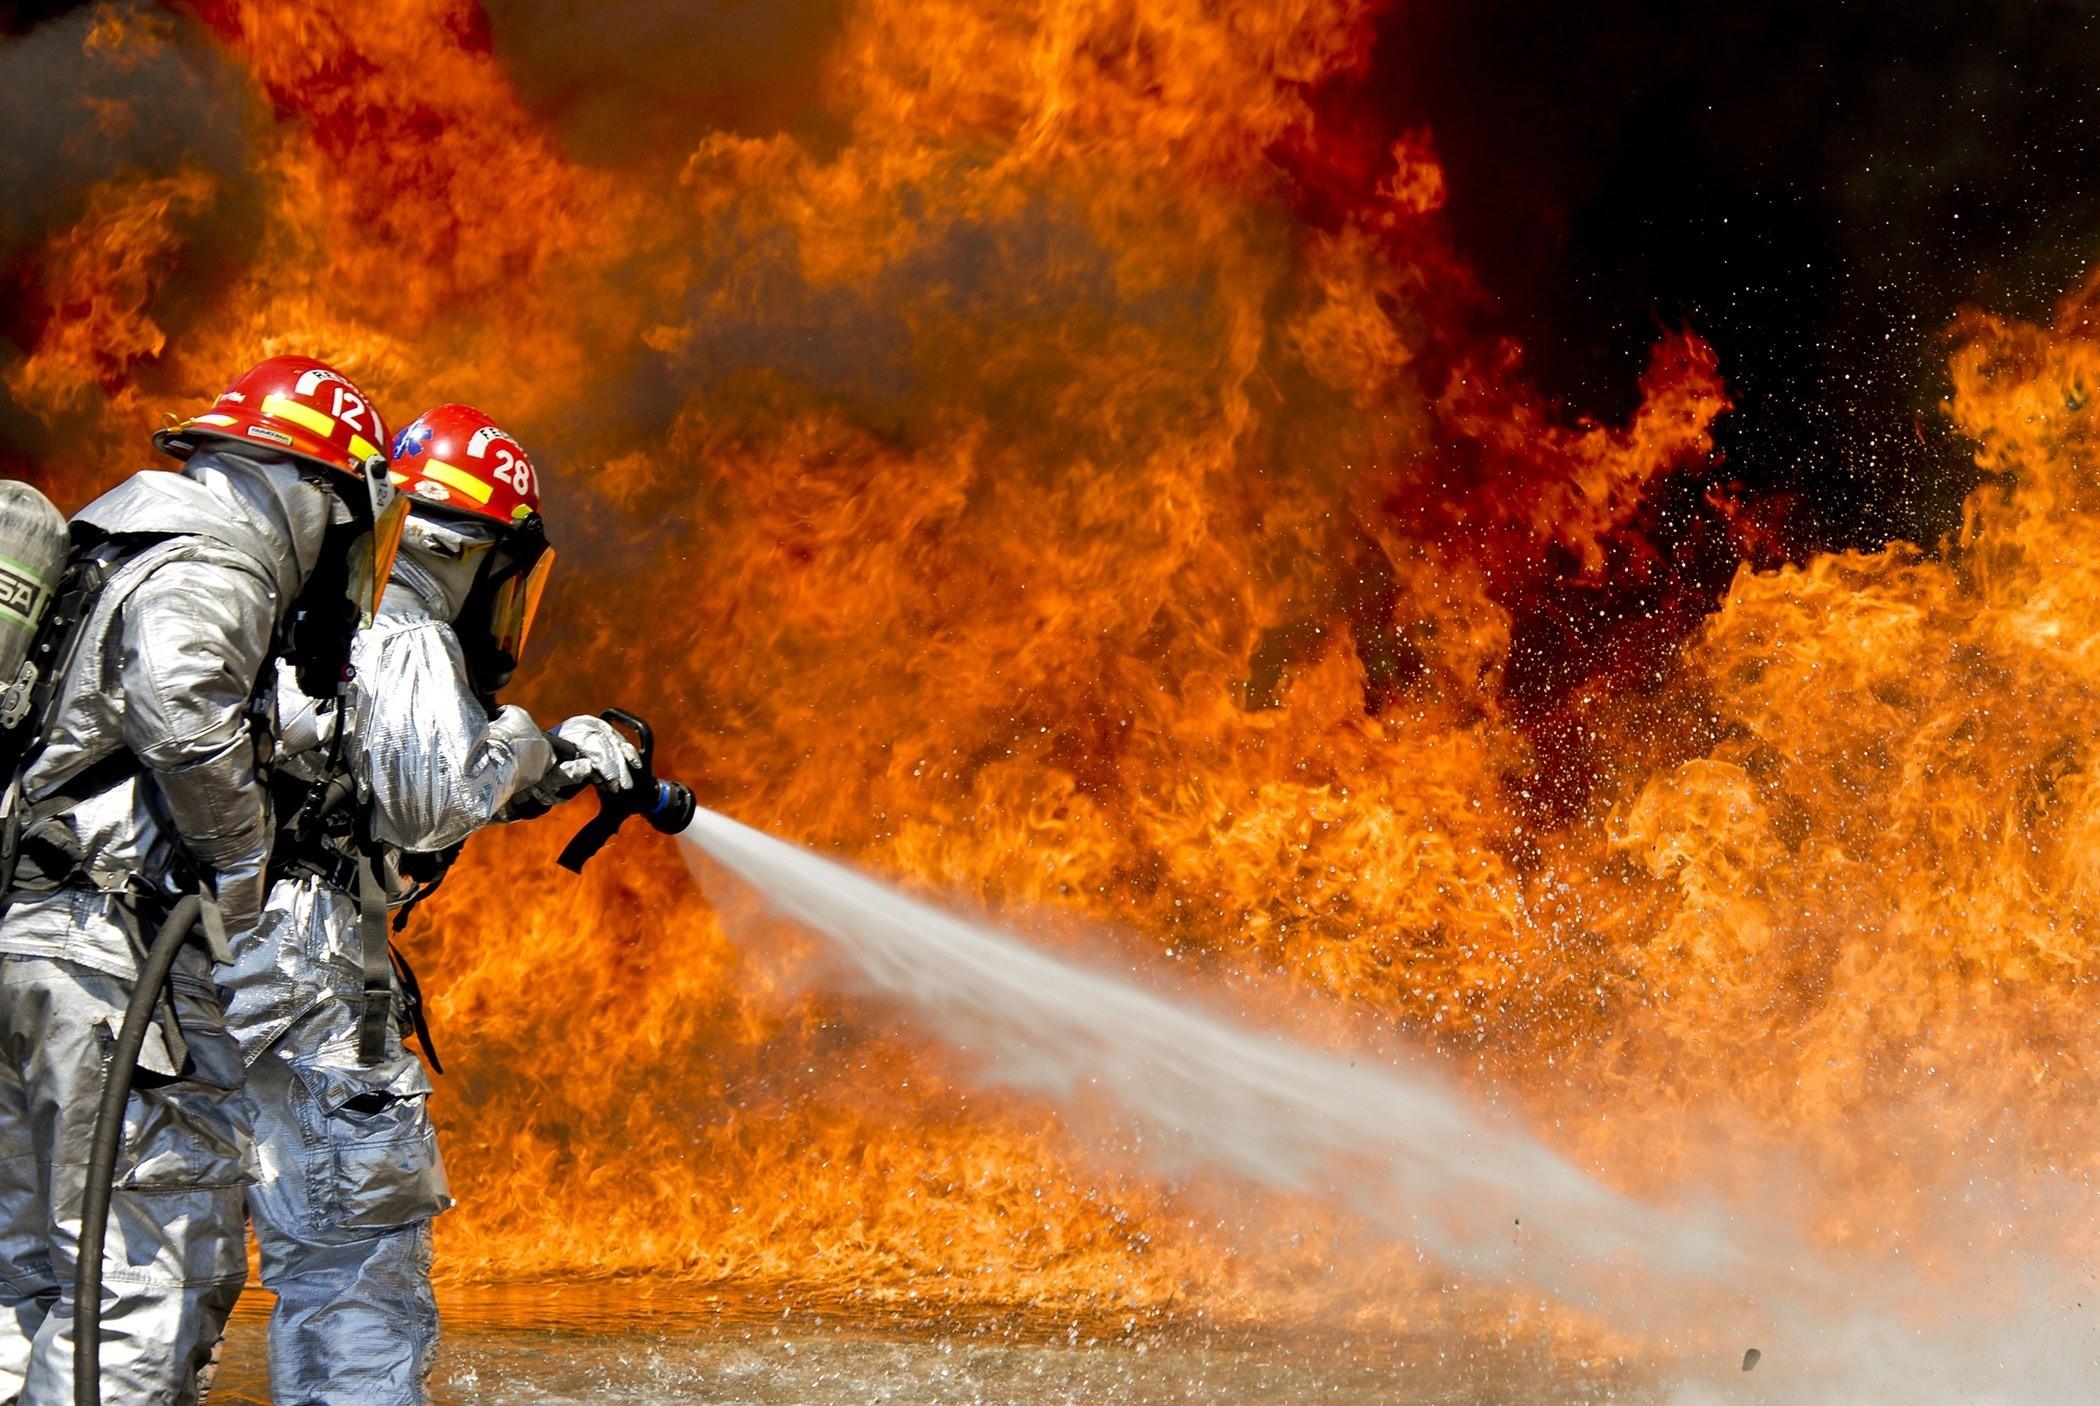 widescreen backgrounds firefighter, 729 kB – Grayling Walls